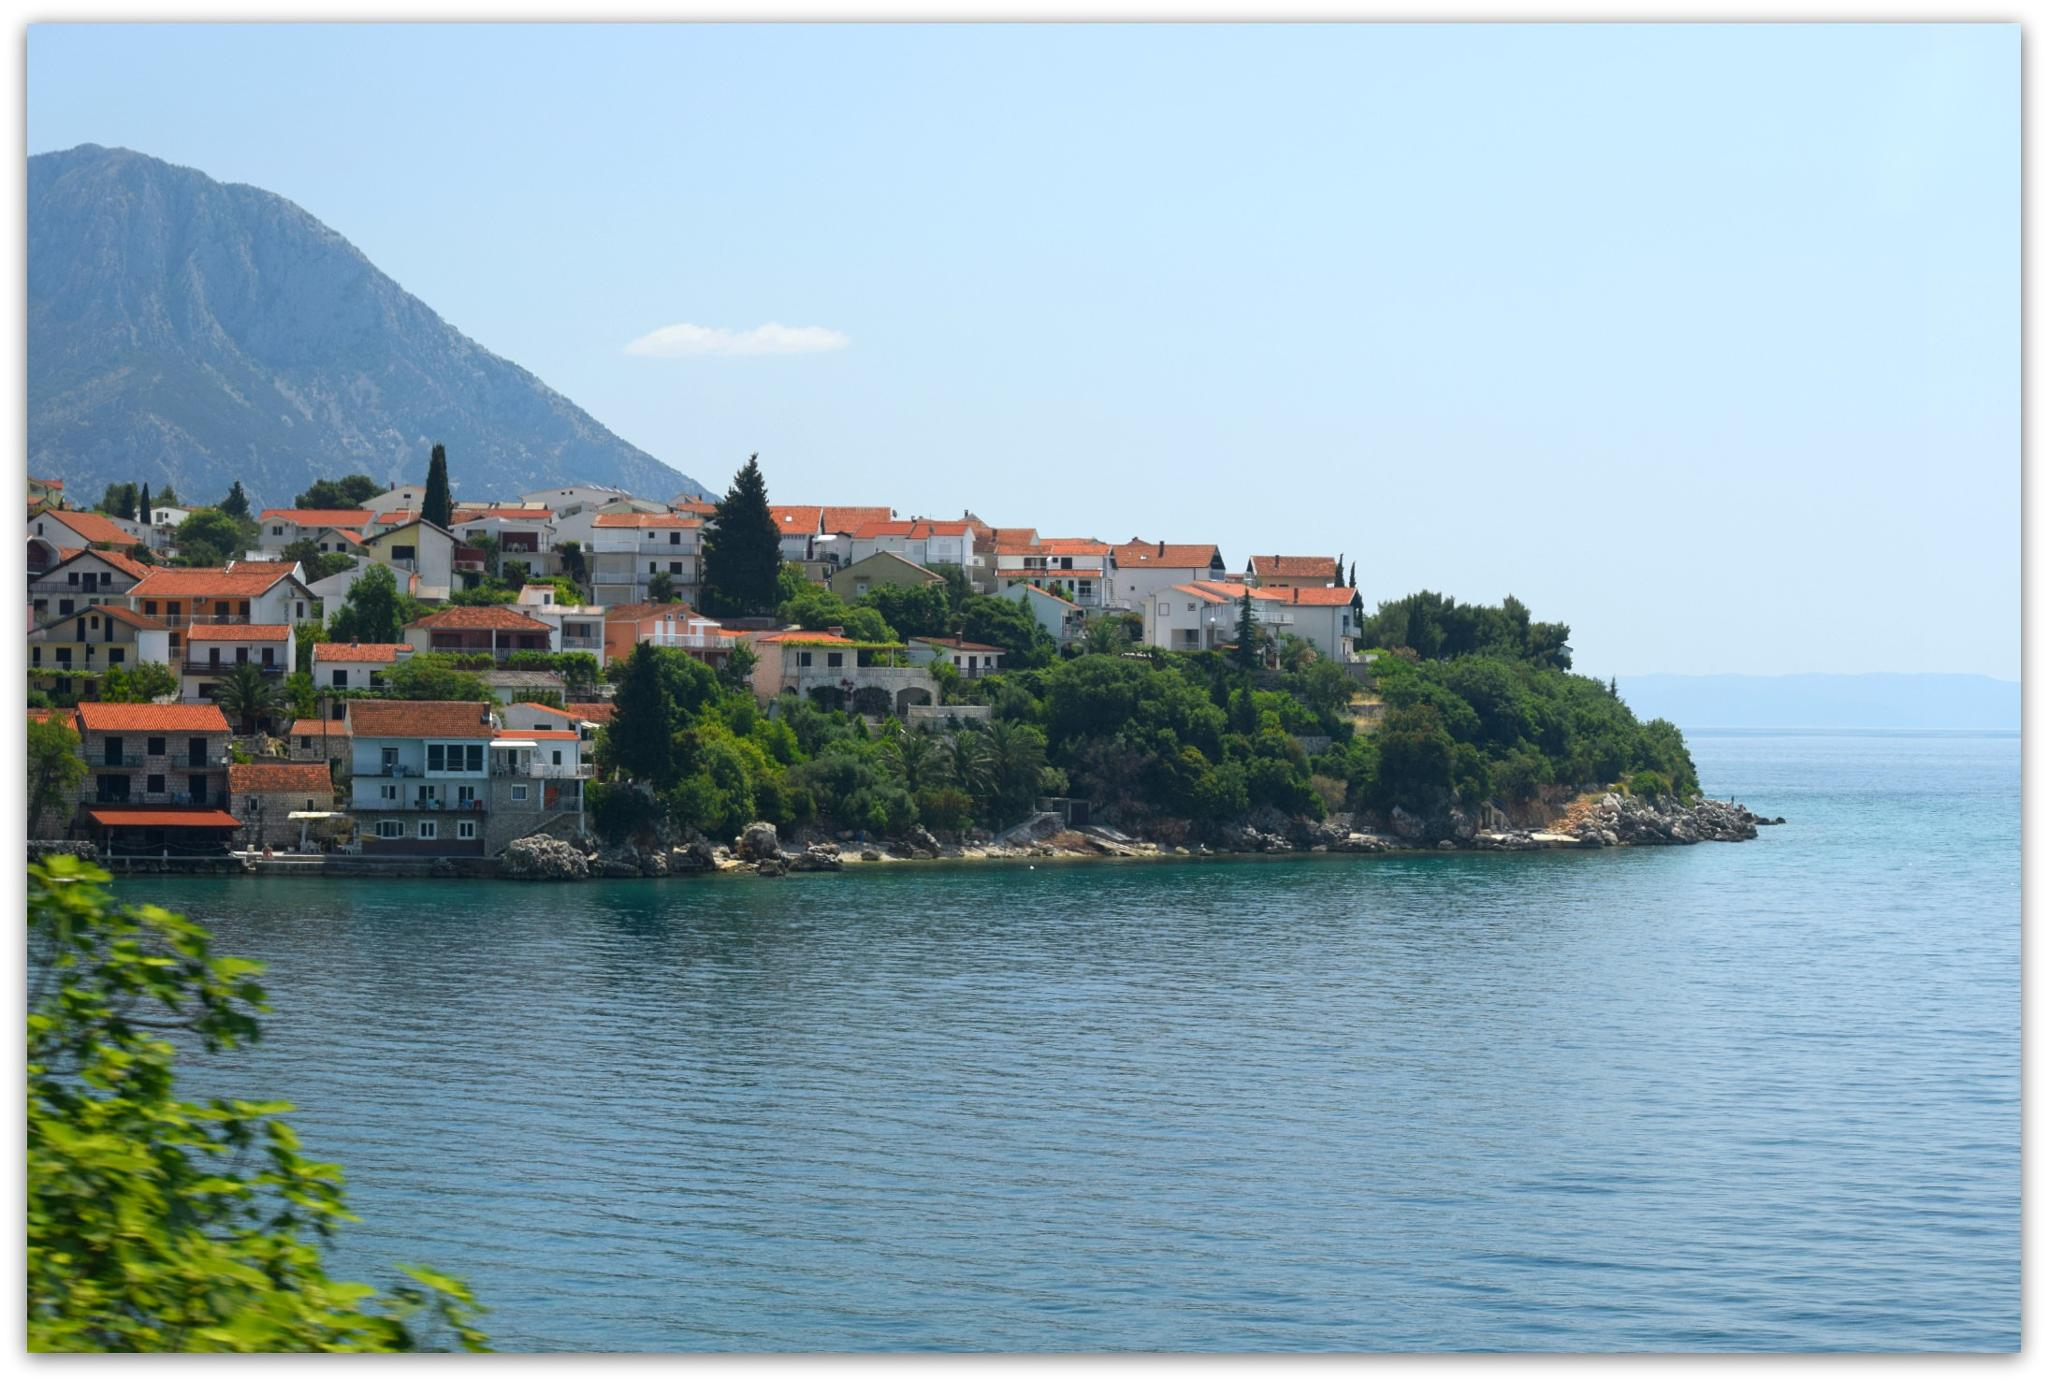 The Dalmatian coast by maria.telegdy